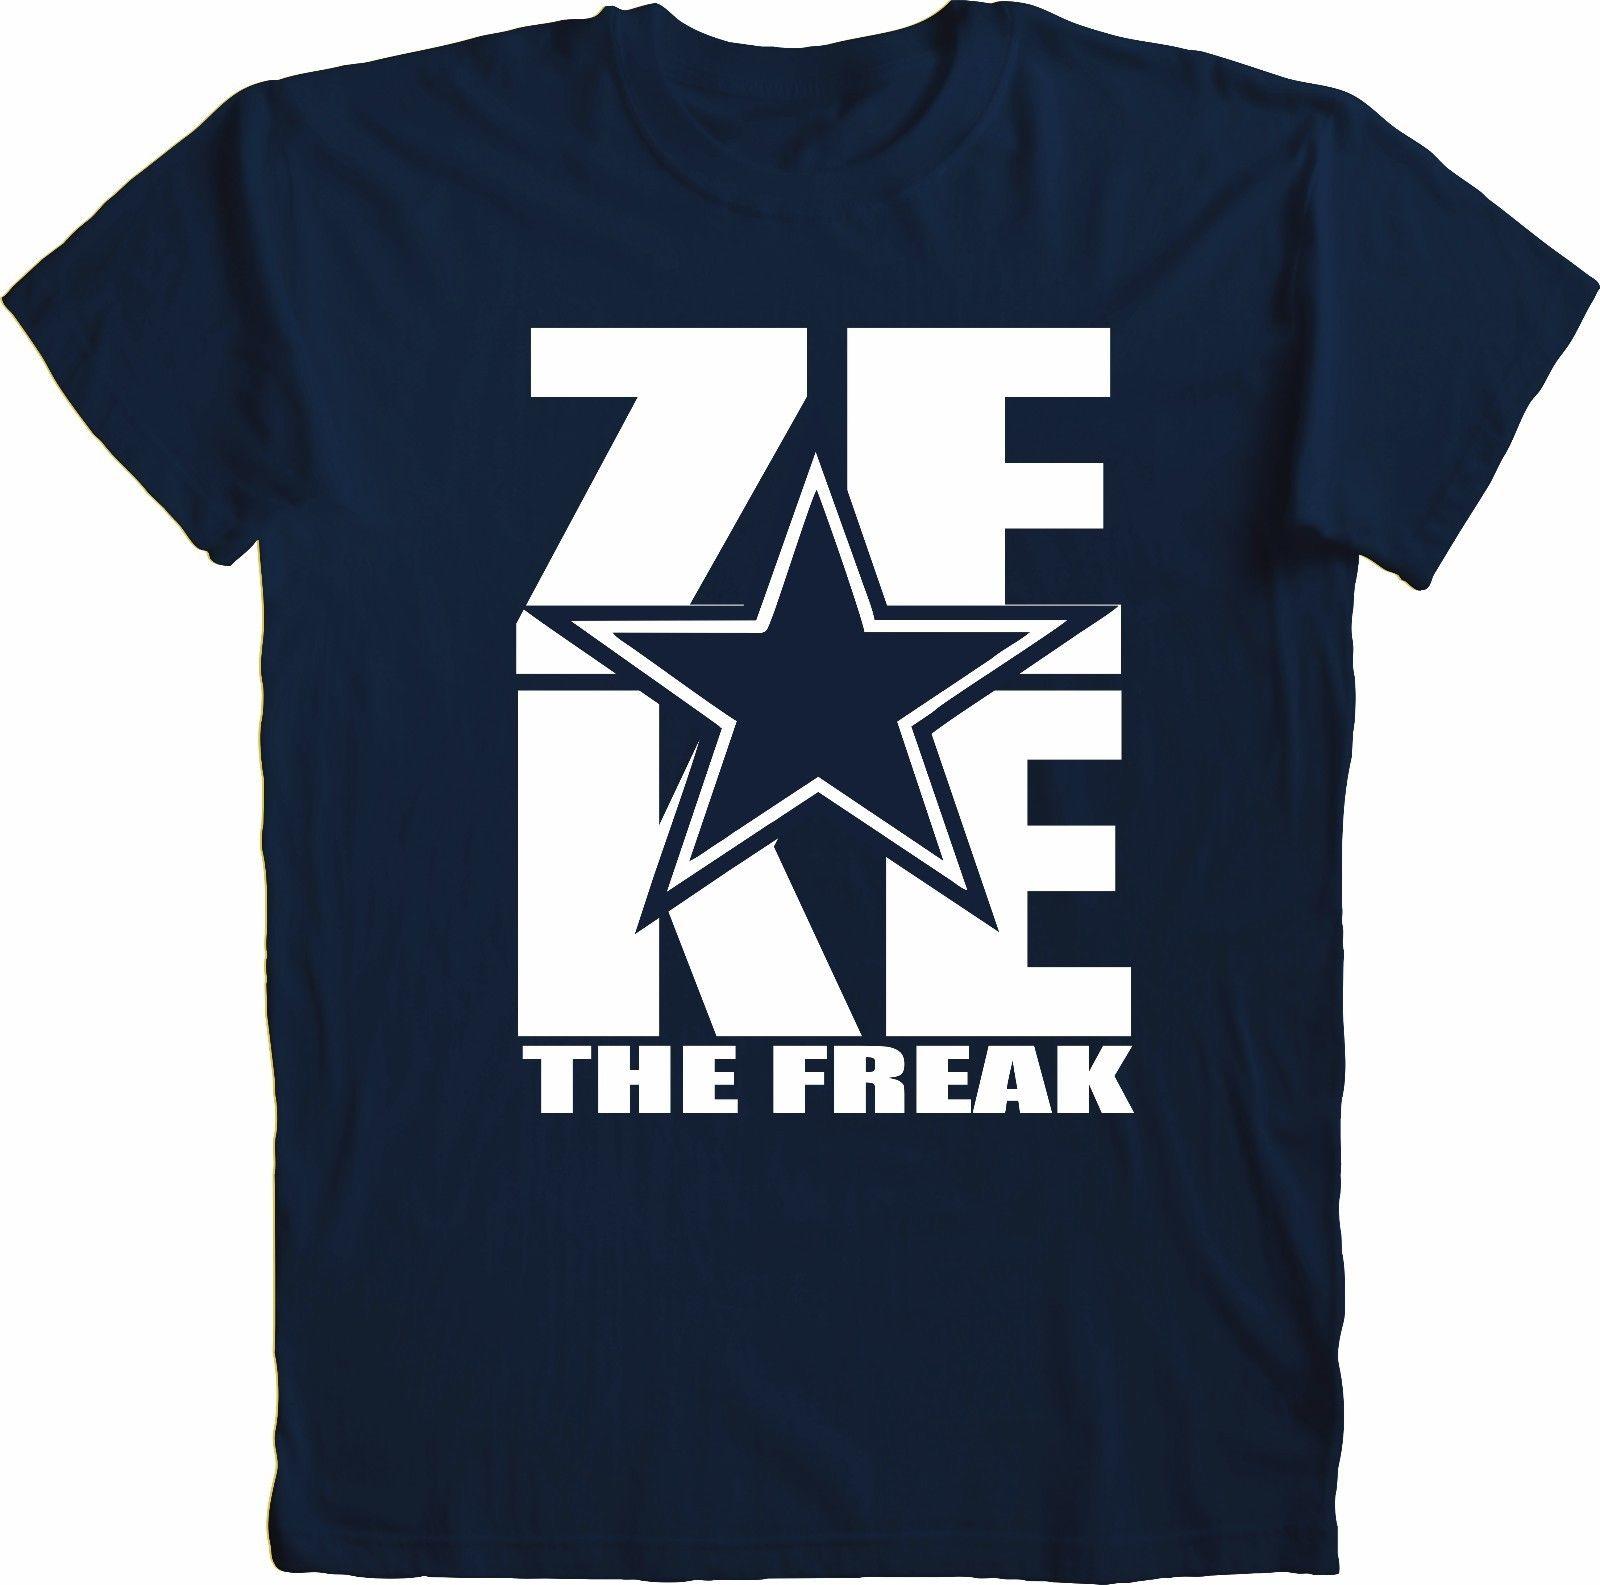 online retailer 9bda5 90be3 US $13.04 13% OFF|Zeke Ezekiel Elliott The Freak Style T Shirt Sizes T  Shirt Hot Sale Clothes Men Summer Short Sleeves Casual Print Tee Shirts-in  ...